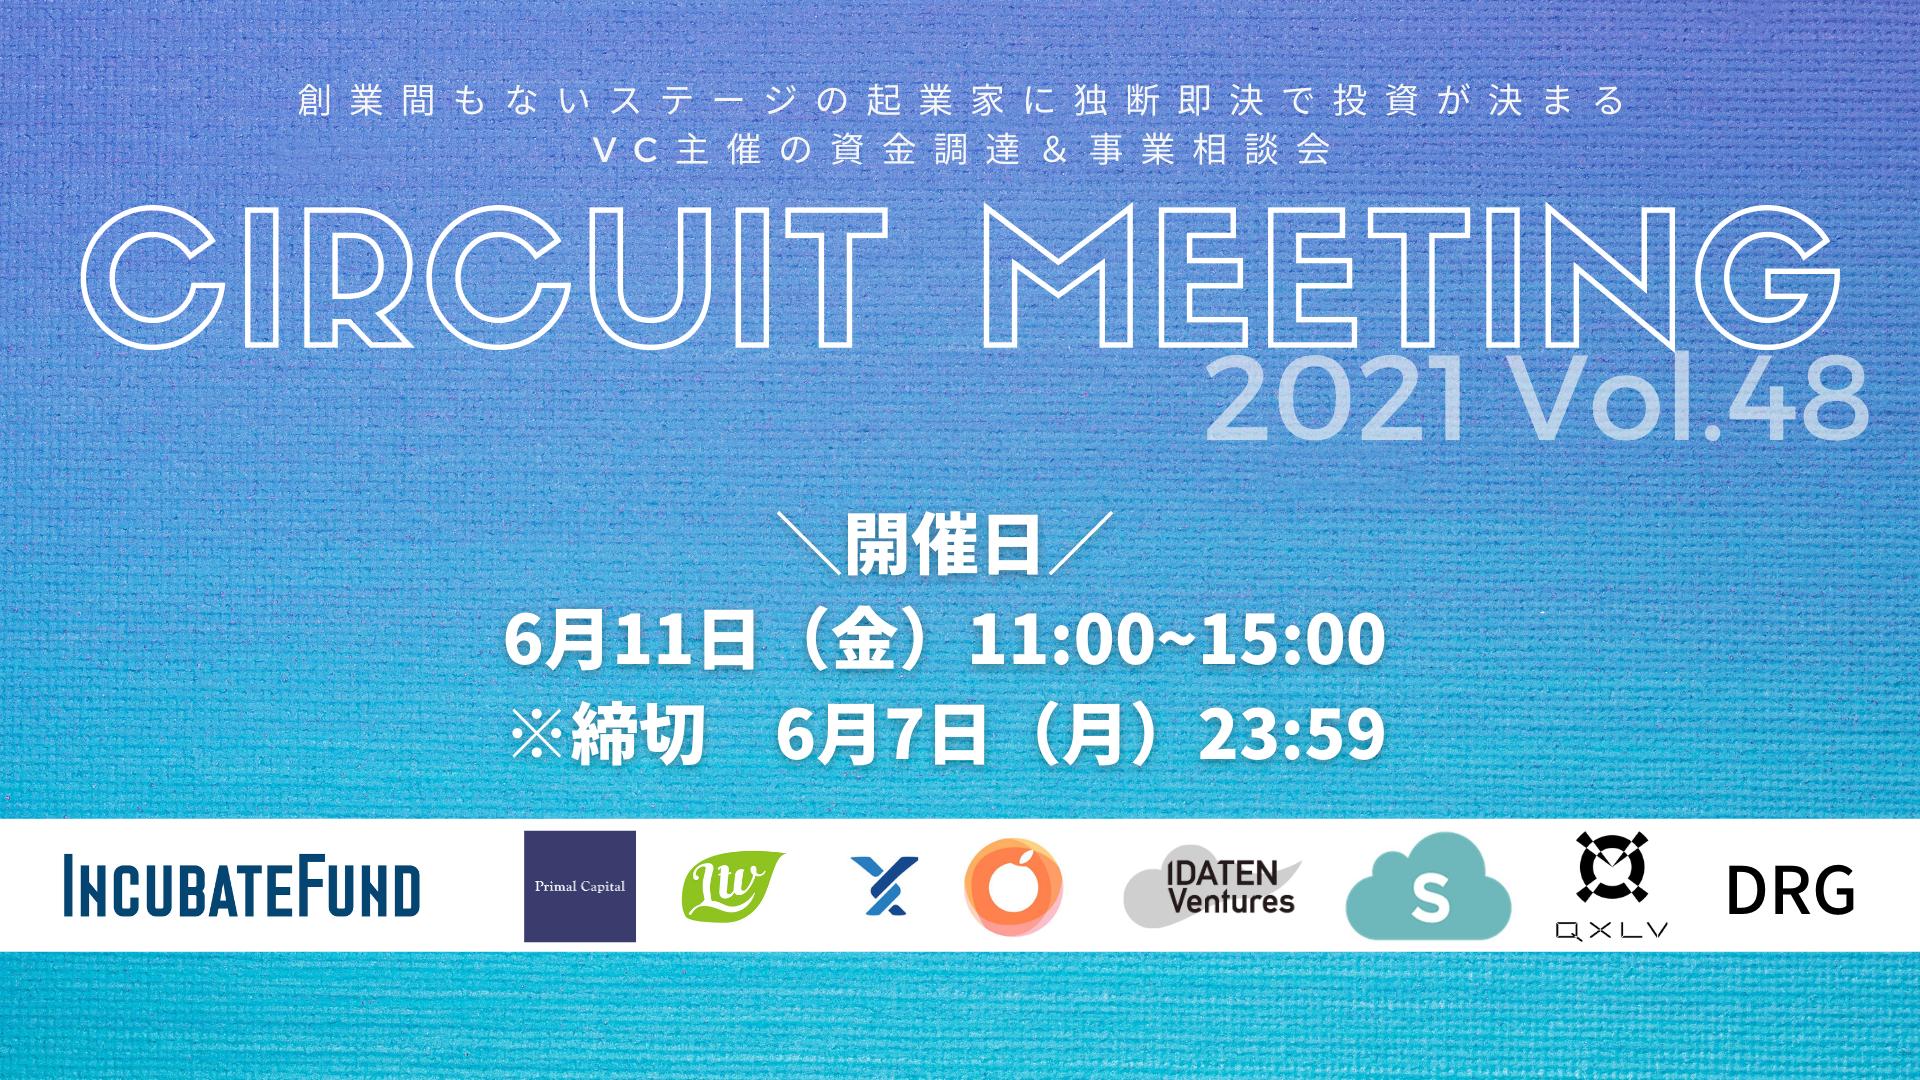 【6/7締切】Circuit Meeting Vol.48